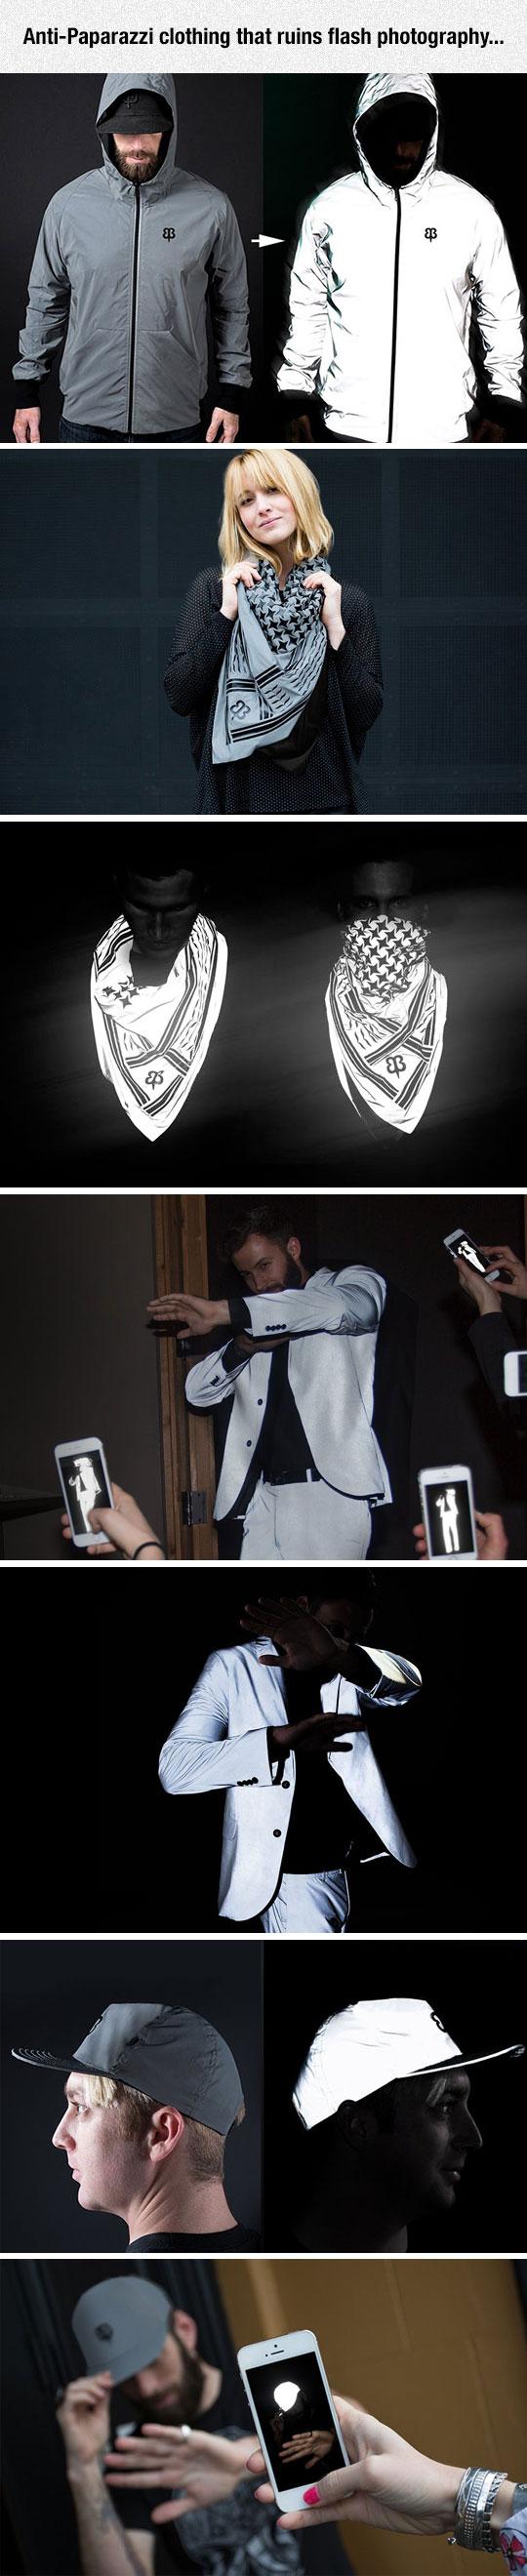 anti-paparazzi-suit-flash